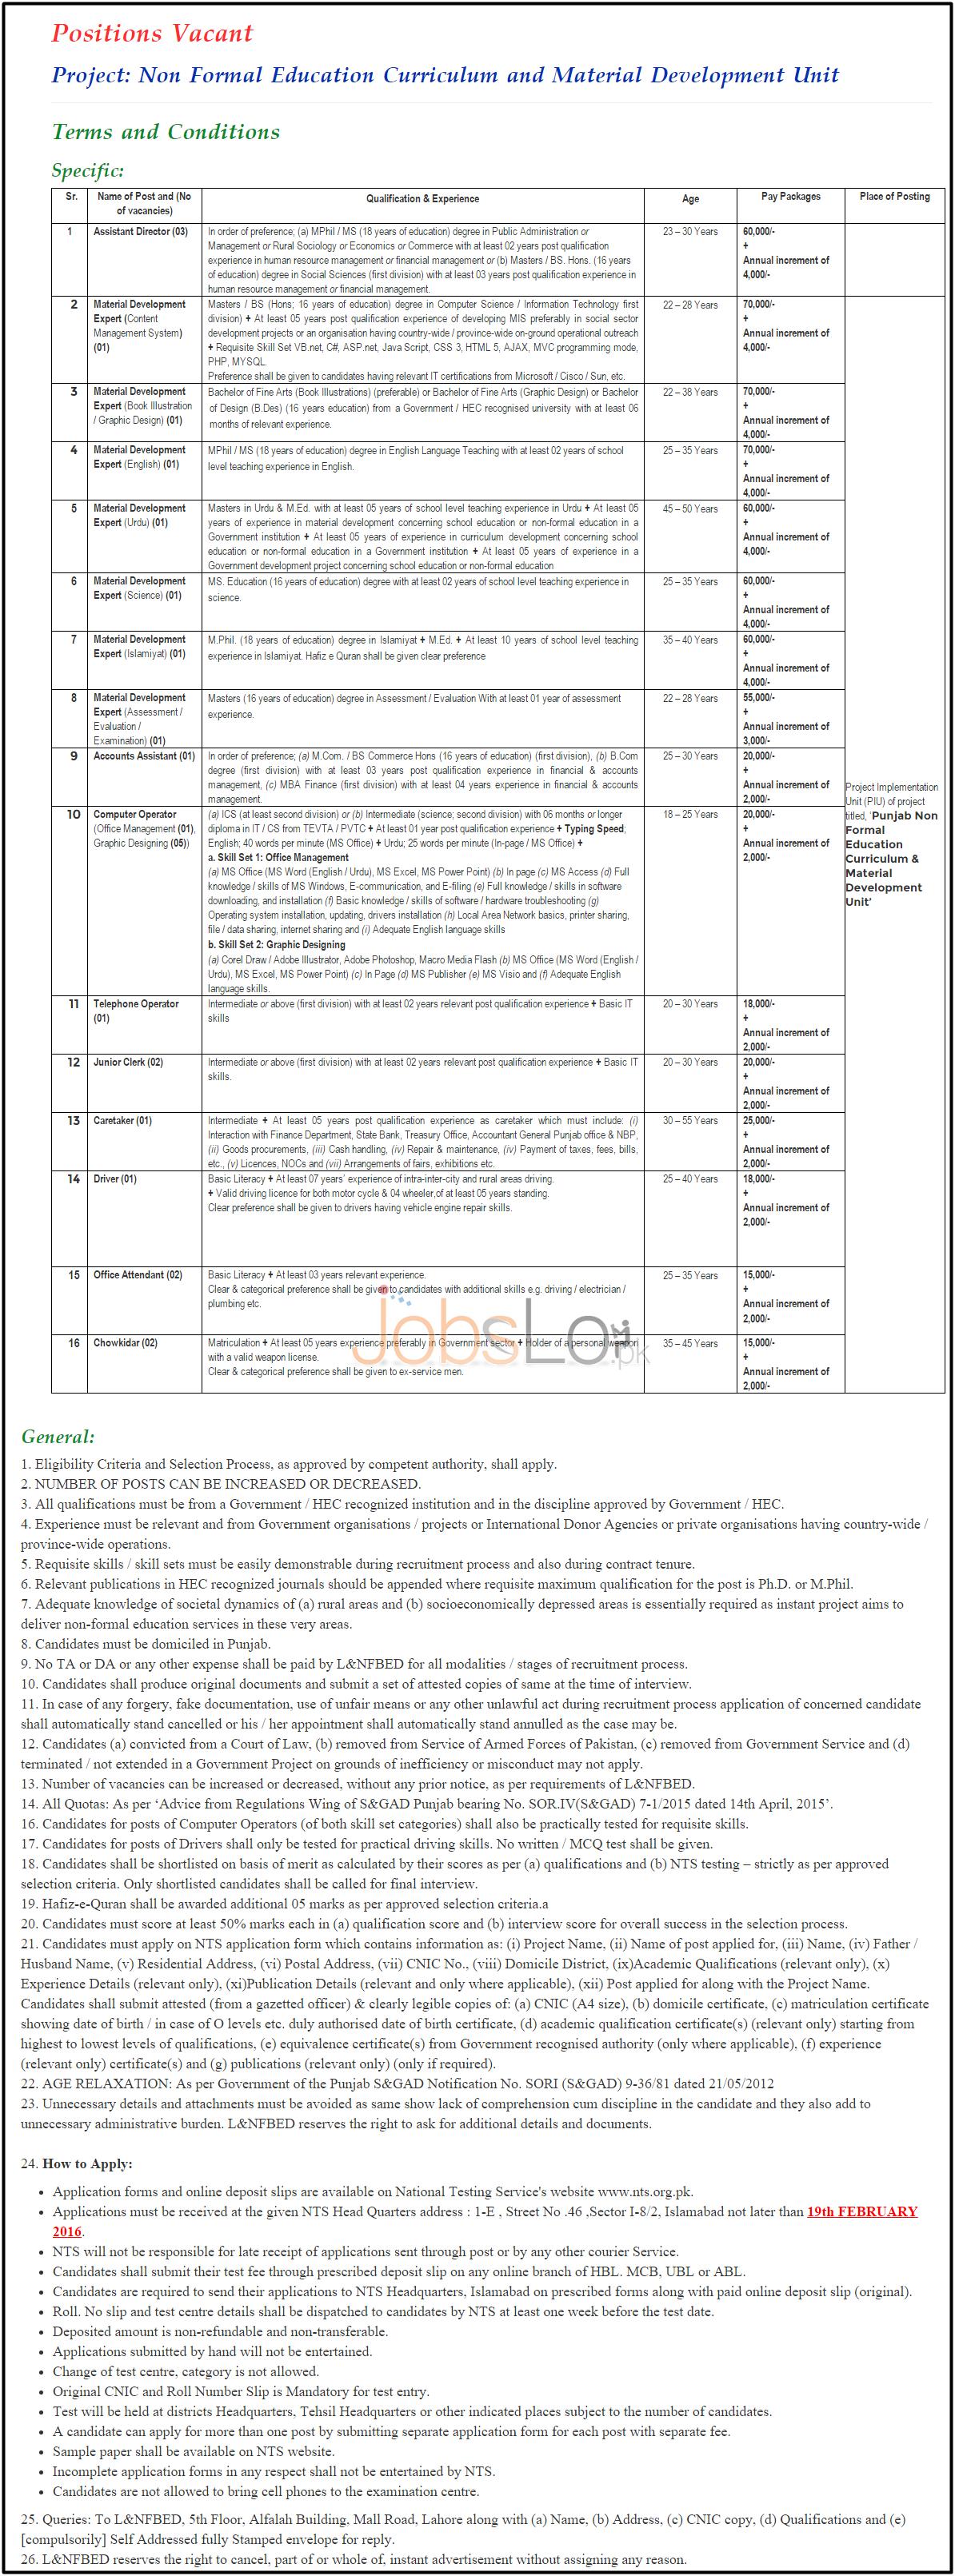 Literacy & NFBE Punjab 2016 Jobs Latest Advertisement